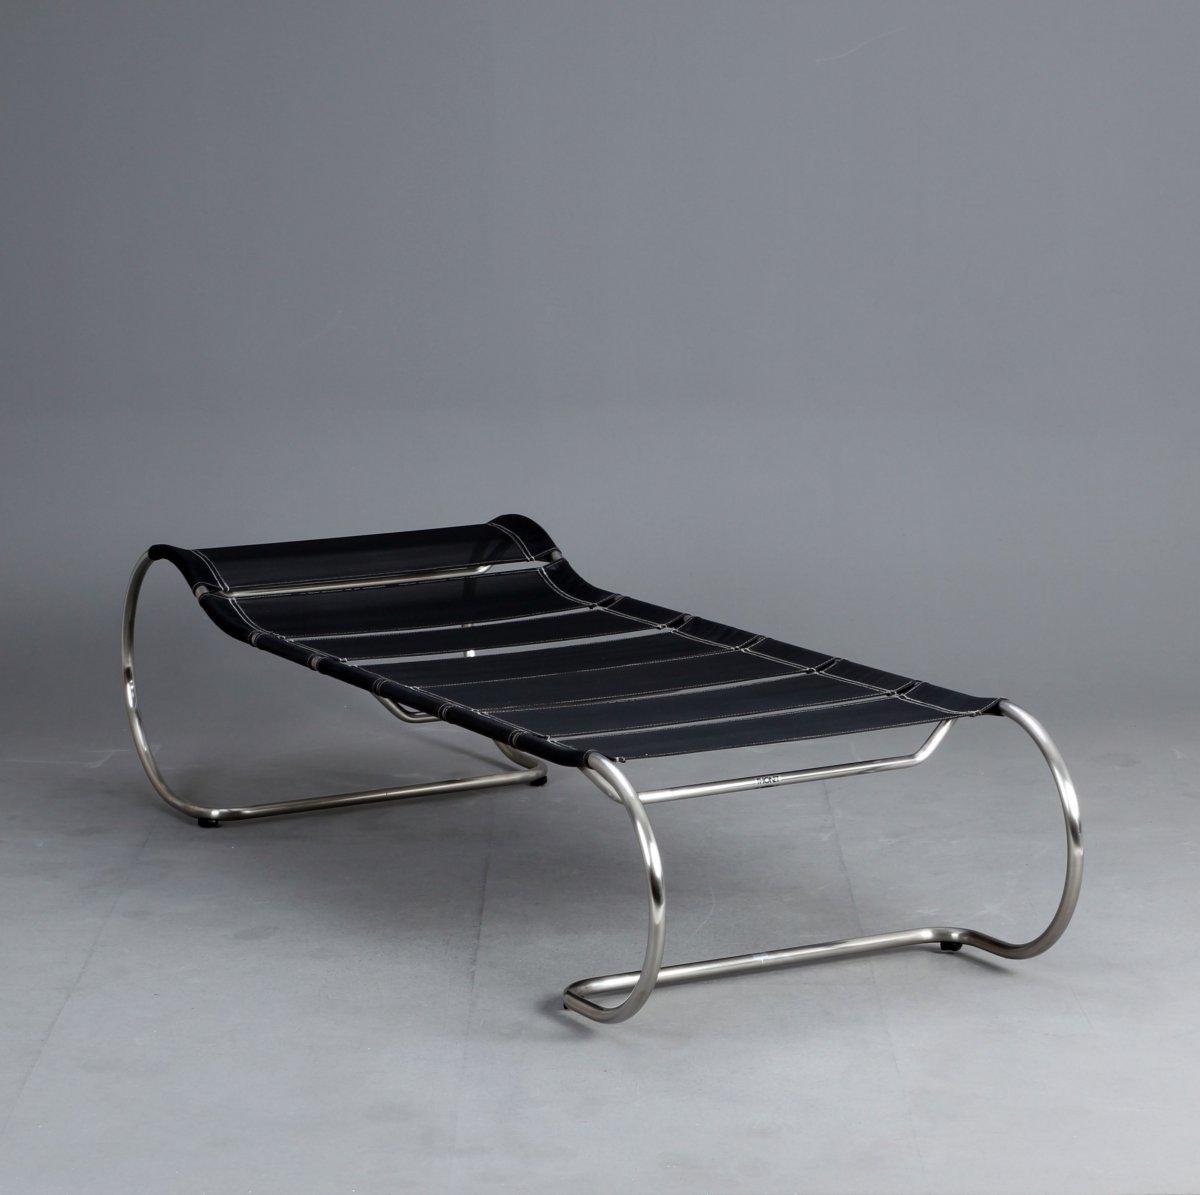 Thonet Liege Daybed Ls 22 Bauhaus Klassiker Edelstahl